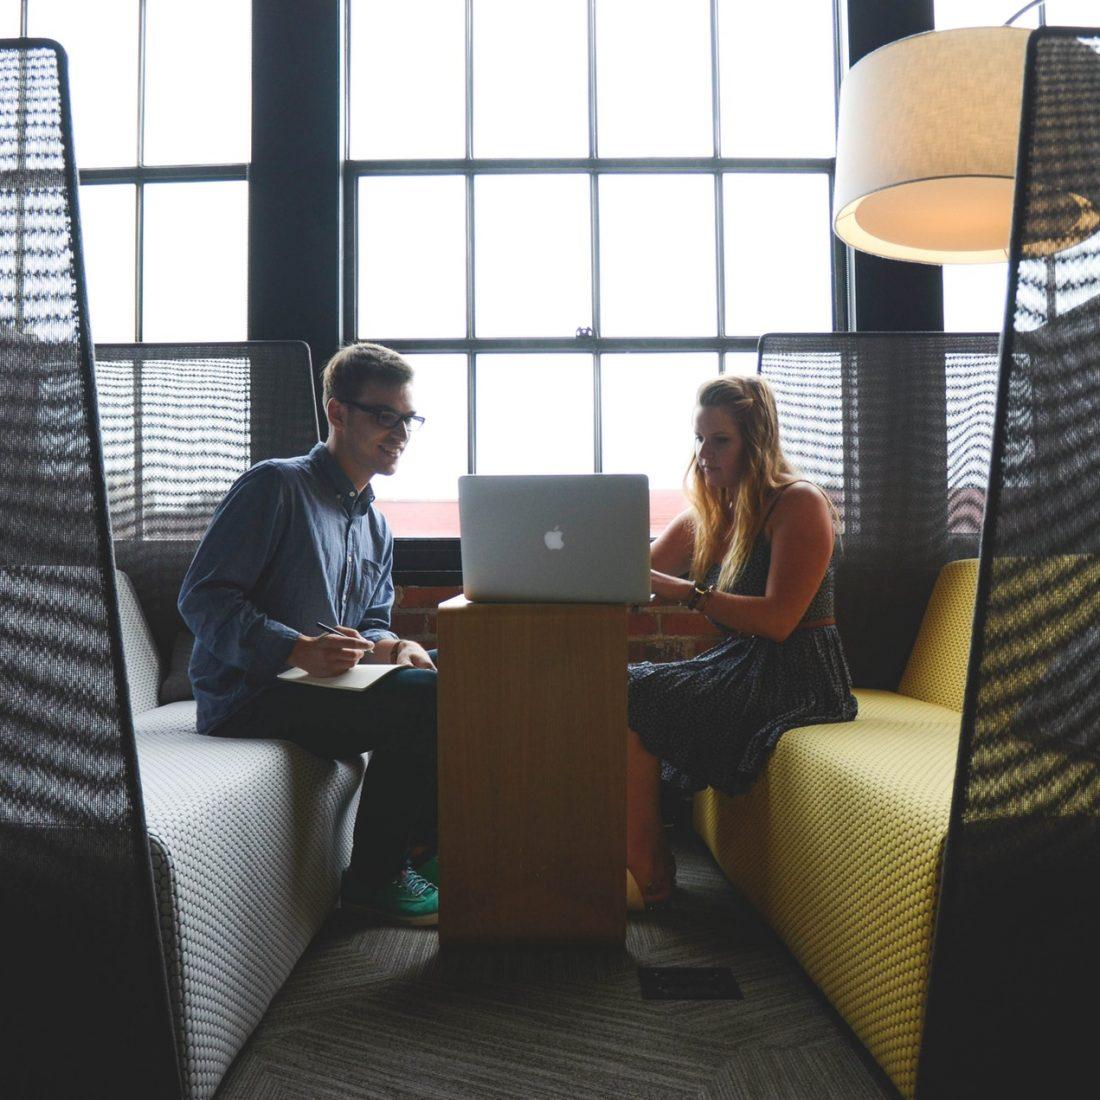 advice-advise-advisor-business-7075